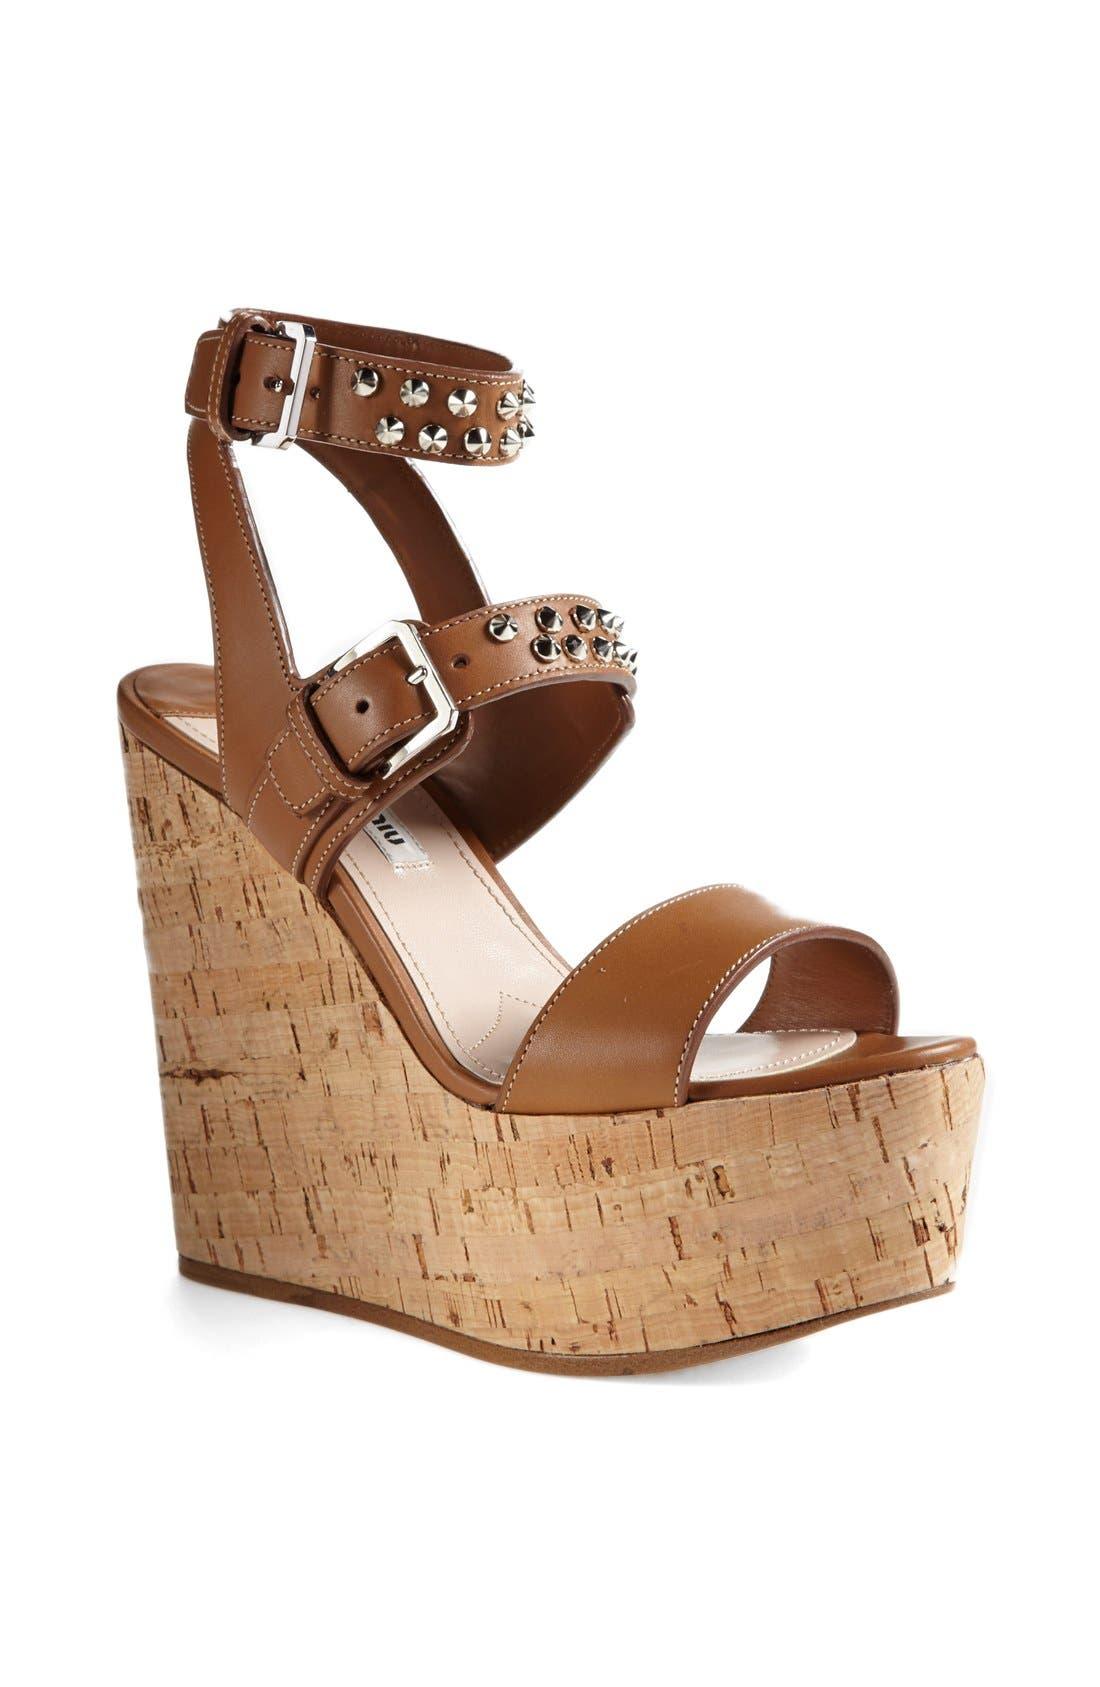 Main Image - Miu Miu Studded Wedge Sandal